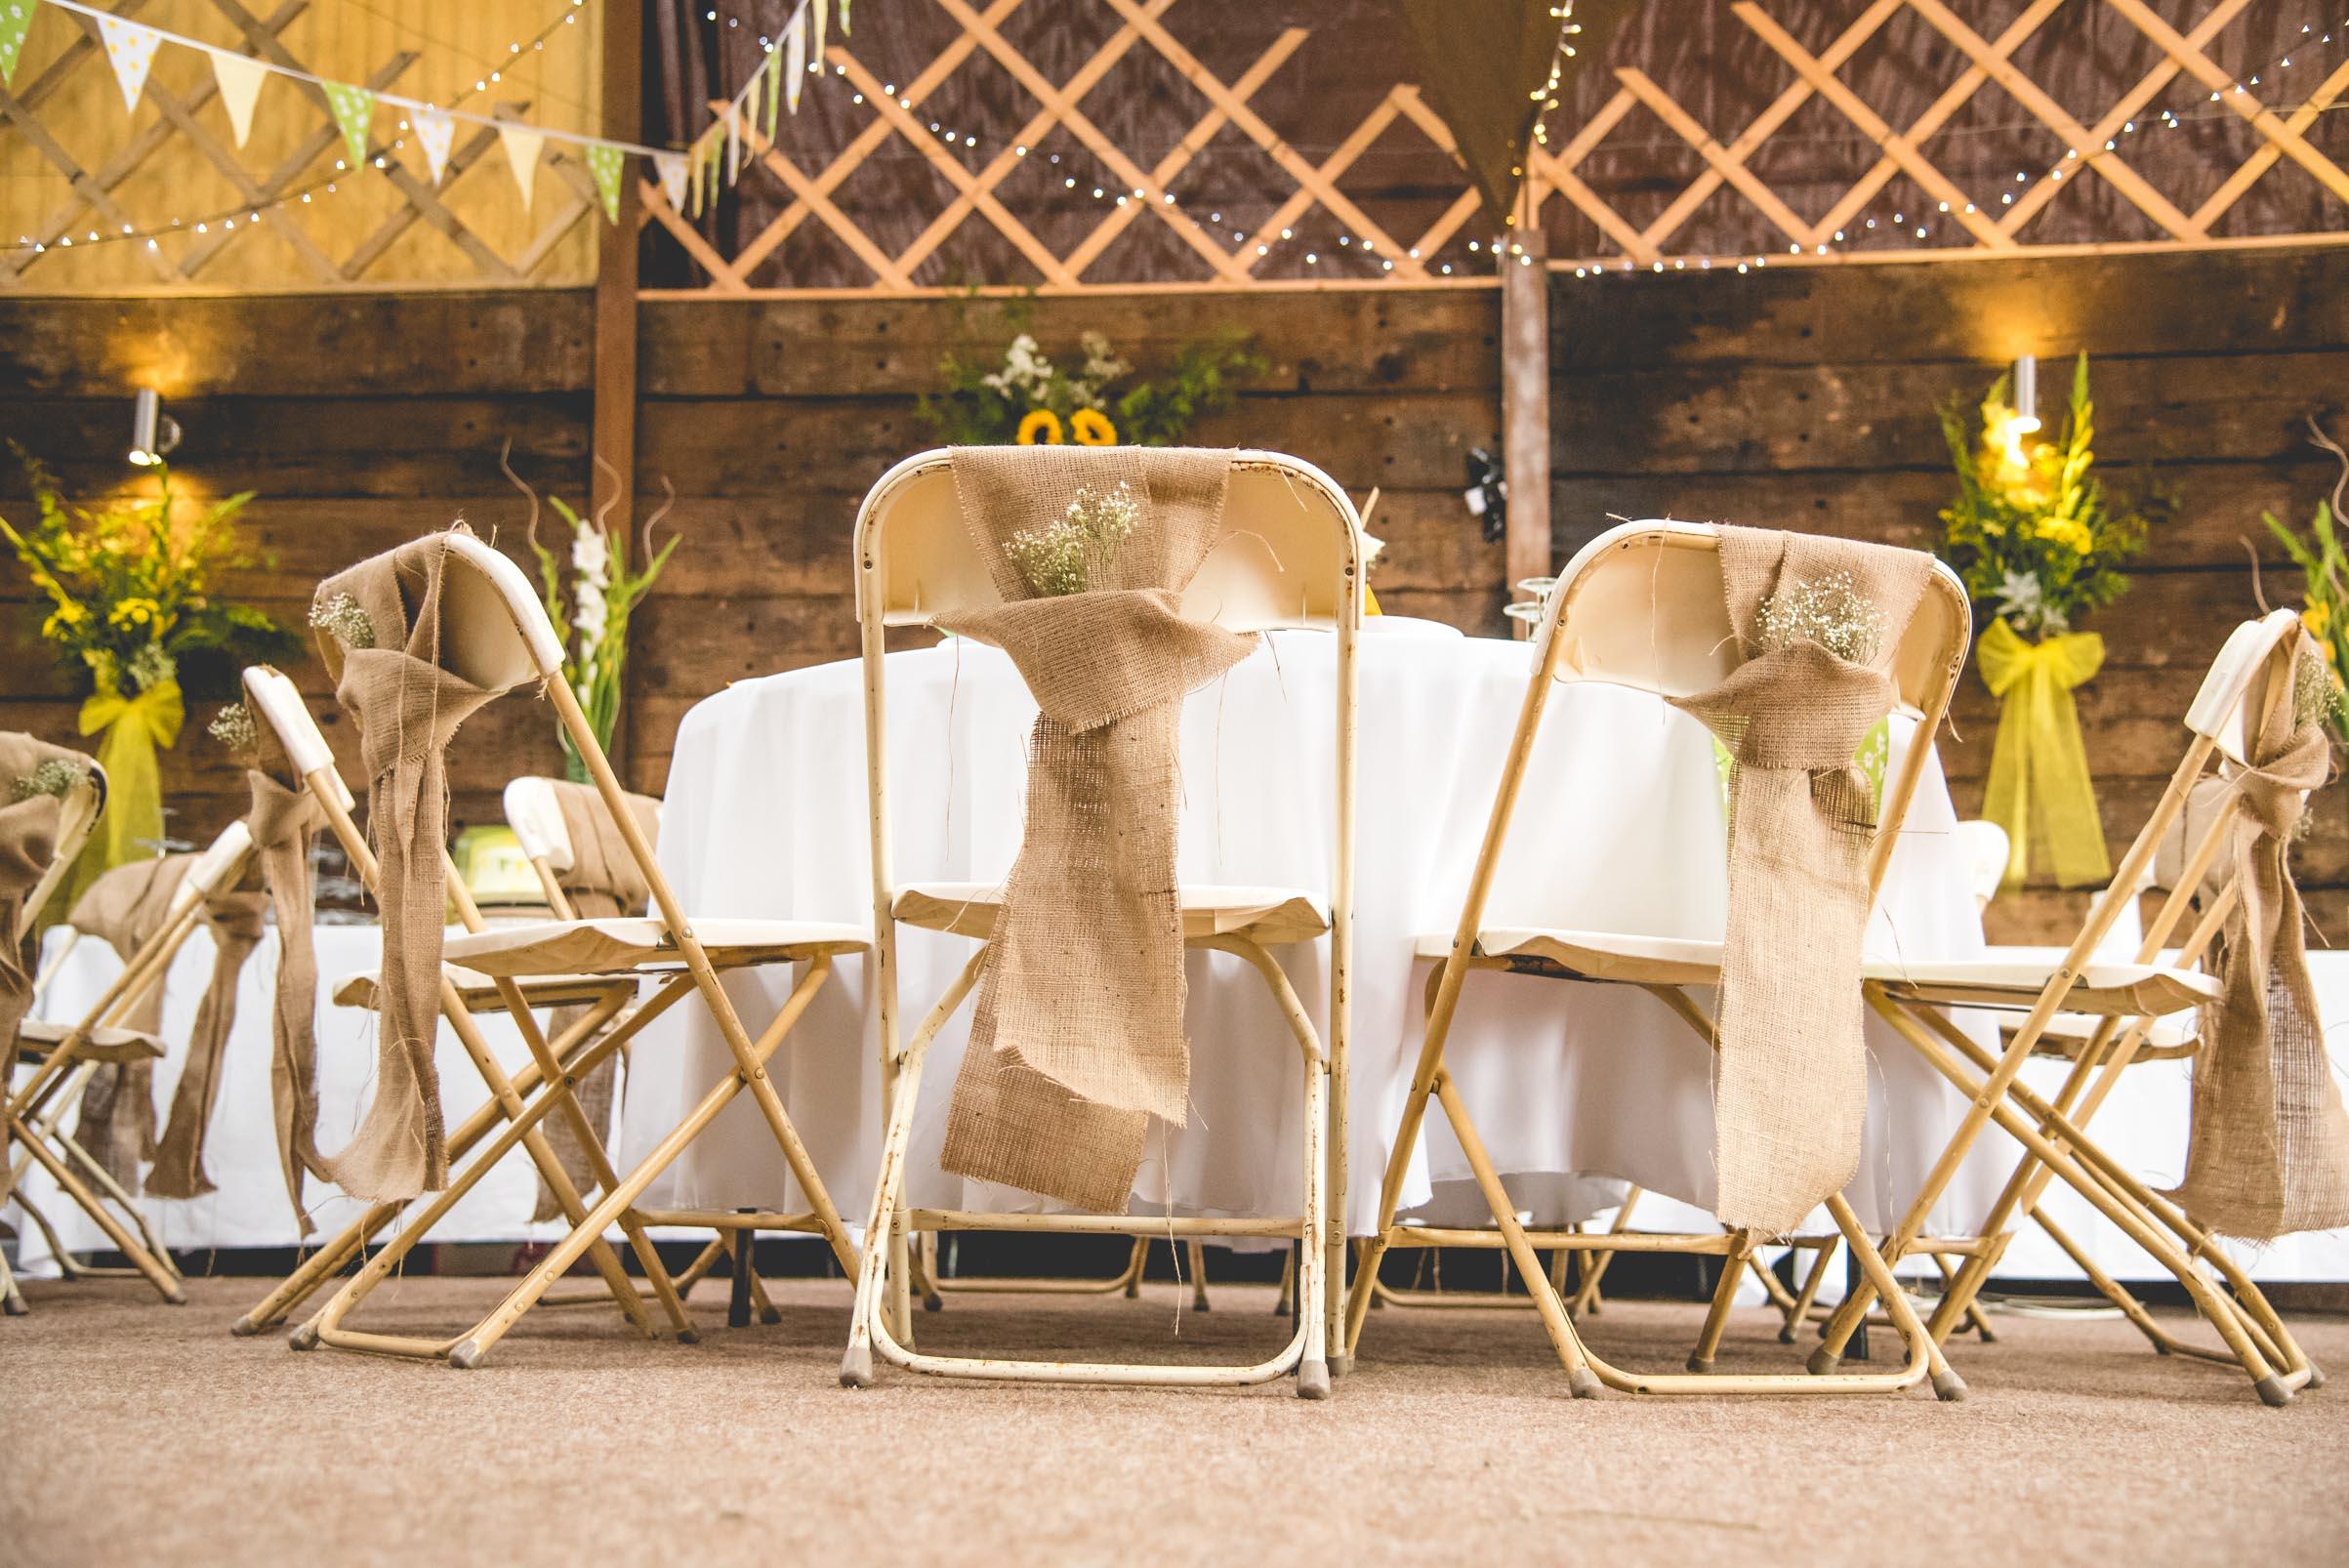 Peak+district+farm+wedding+lower+damgate+photographer-19.jpg